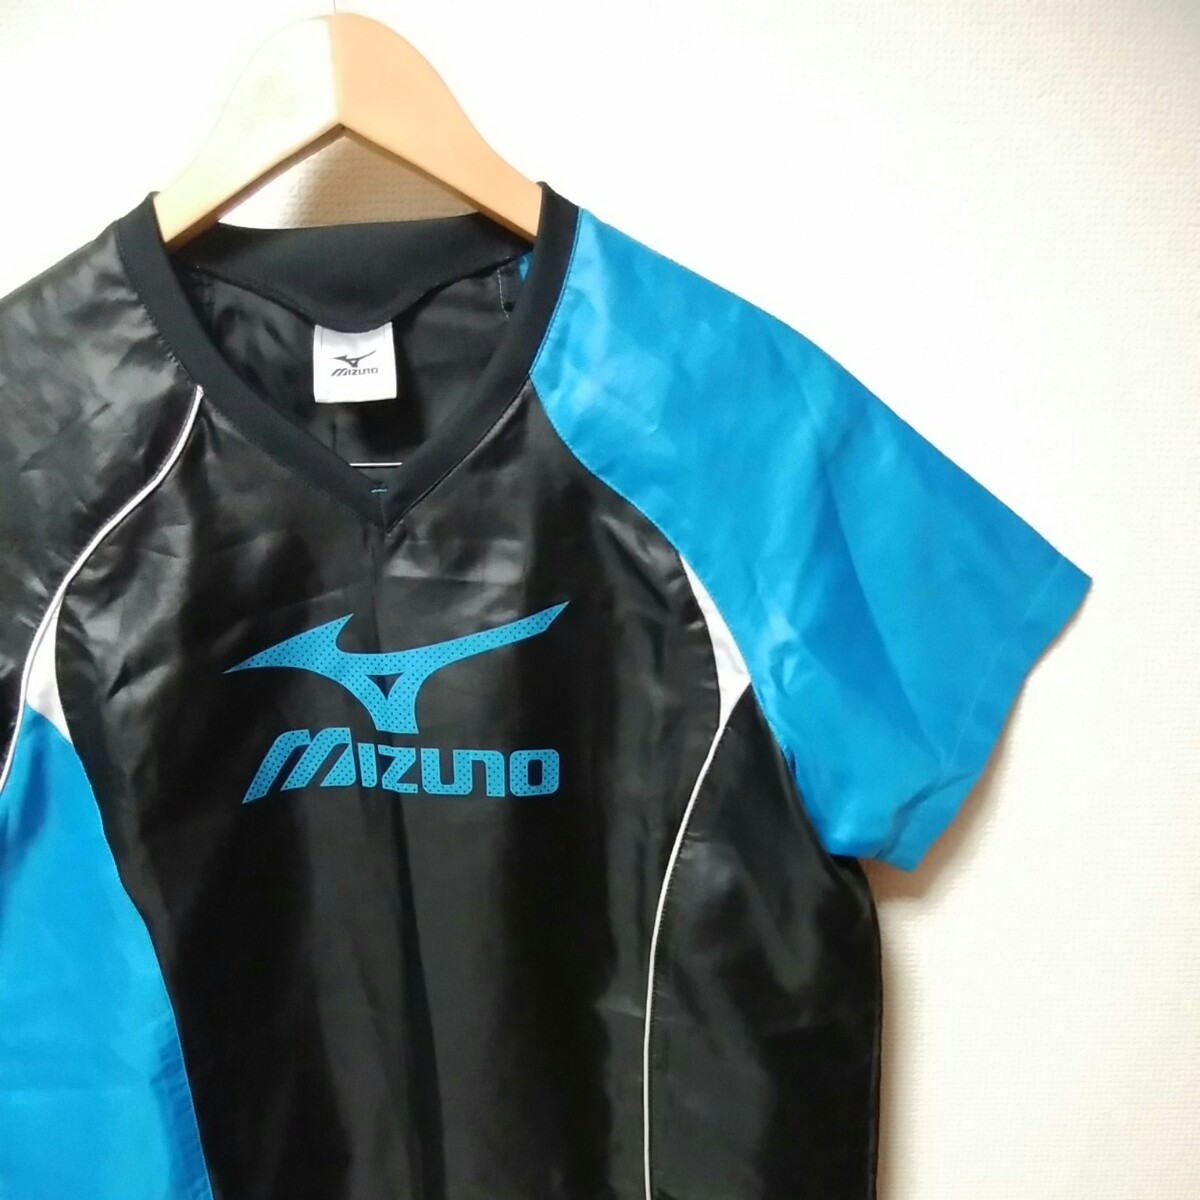 MIZUNO ミズノ 美品 レディース M ウィンドブレーカー スポーツ ウェア